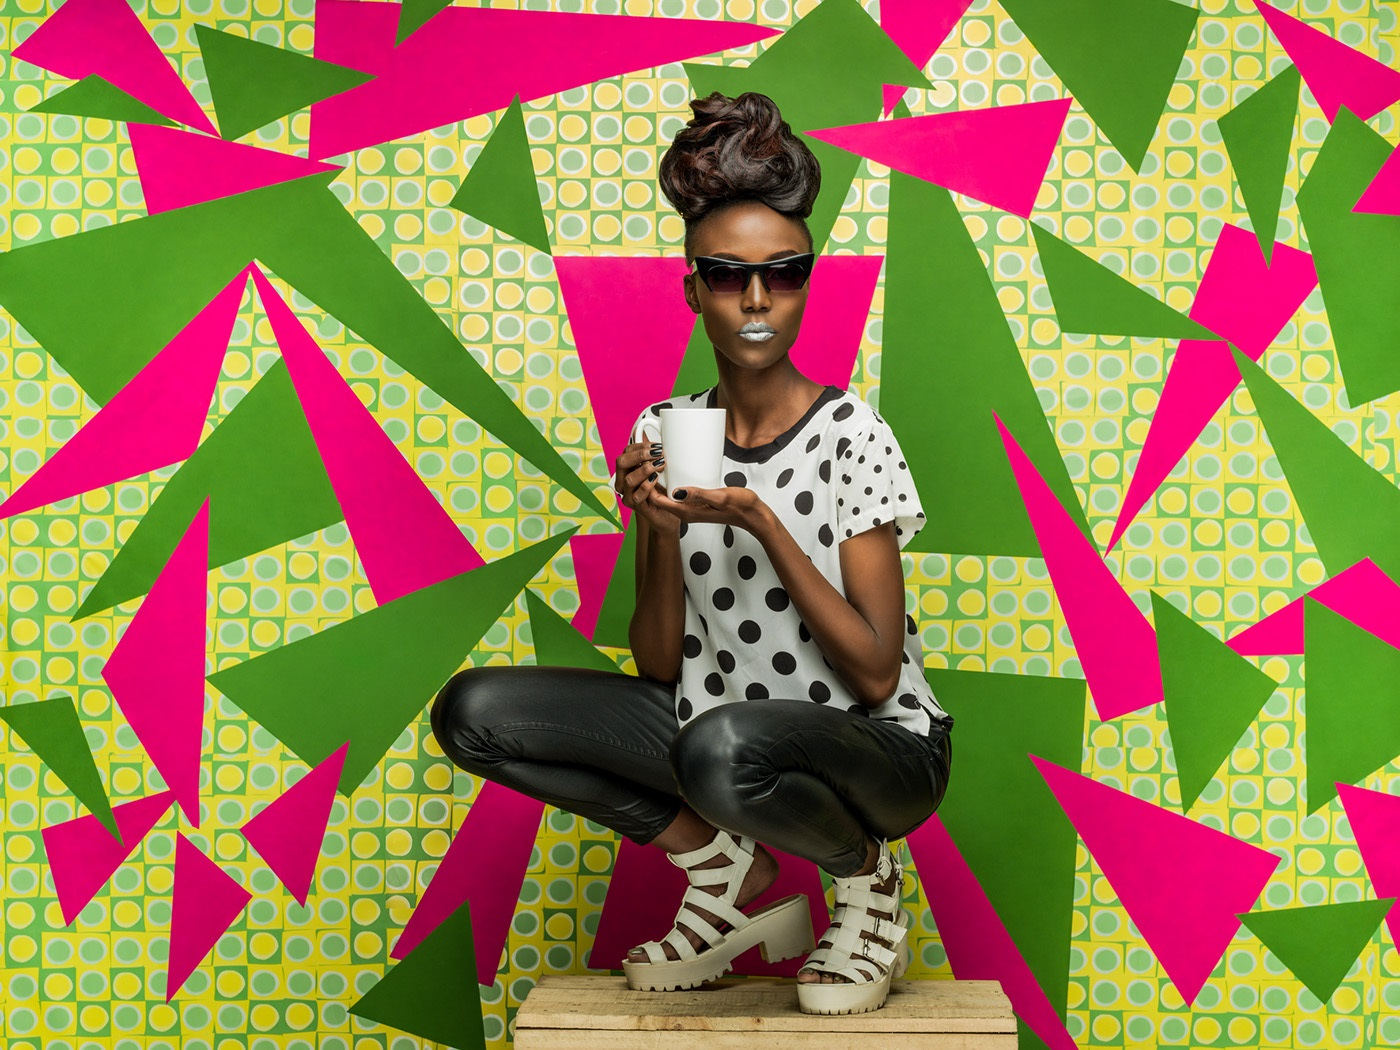 portrait photography triangles by osborne macharia